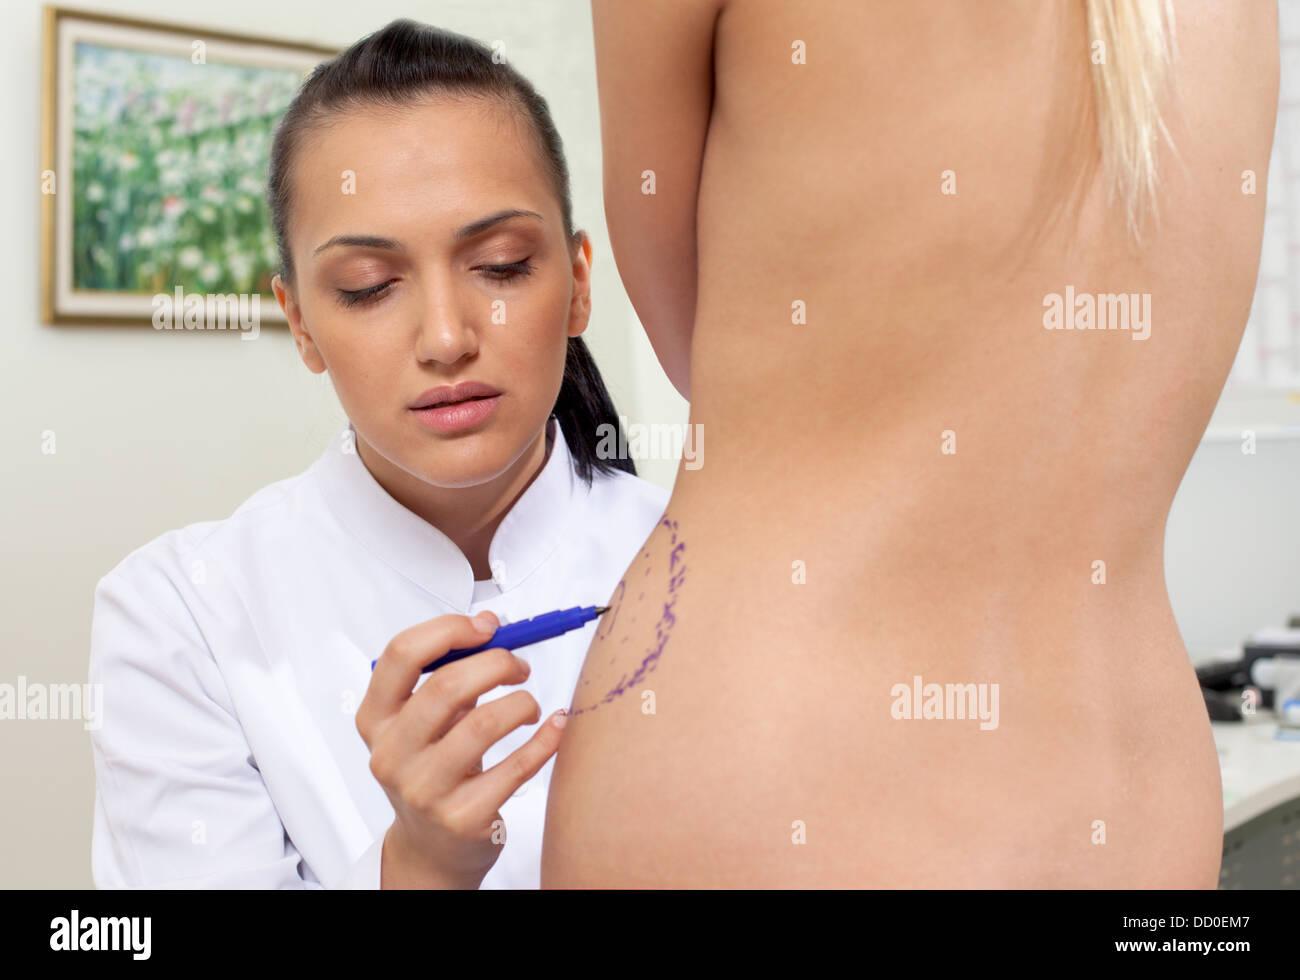 Doctor plastic correction lines body - Stock Image